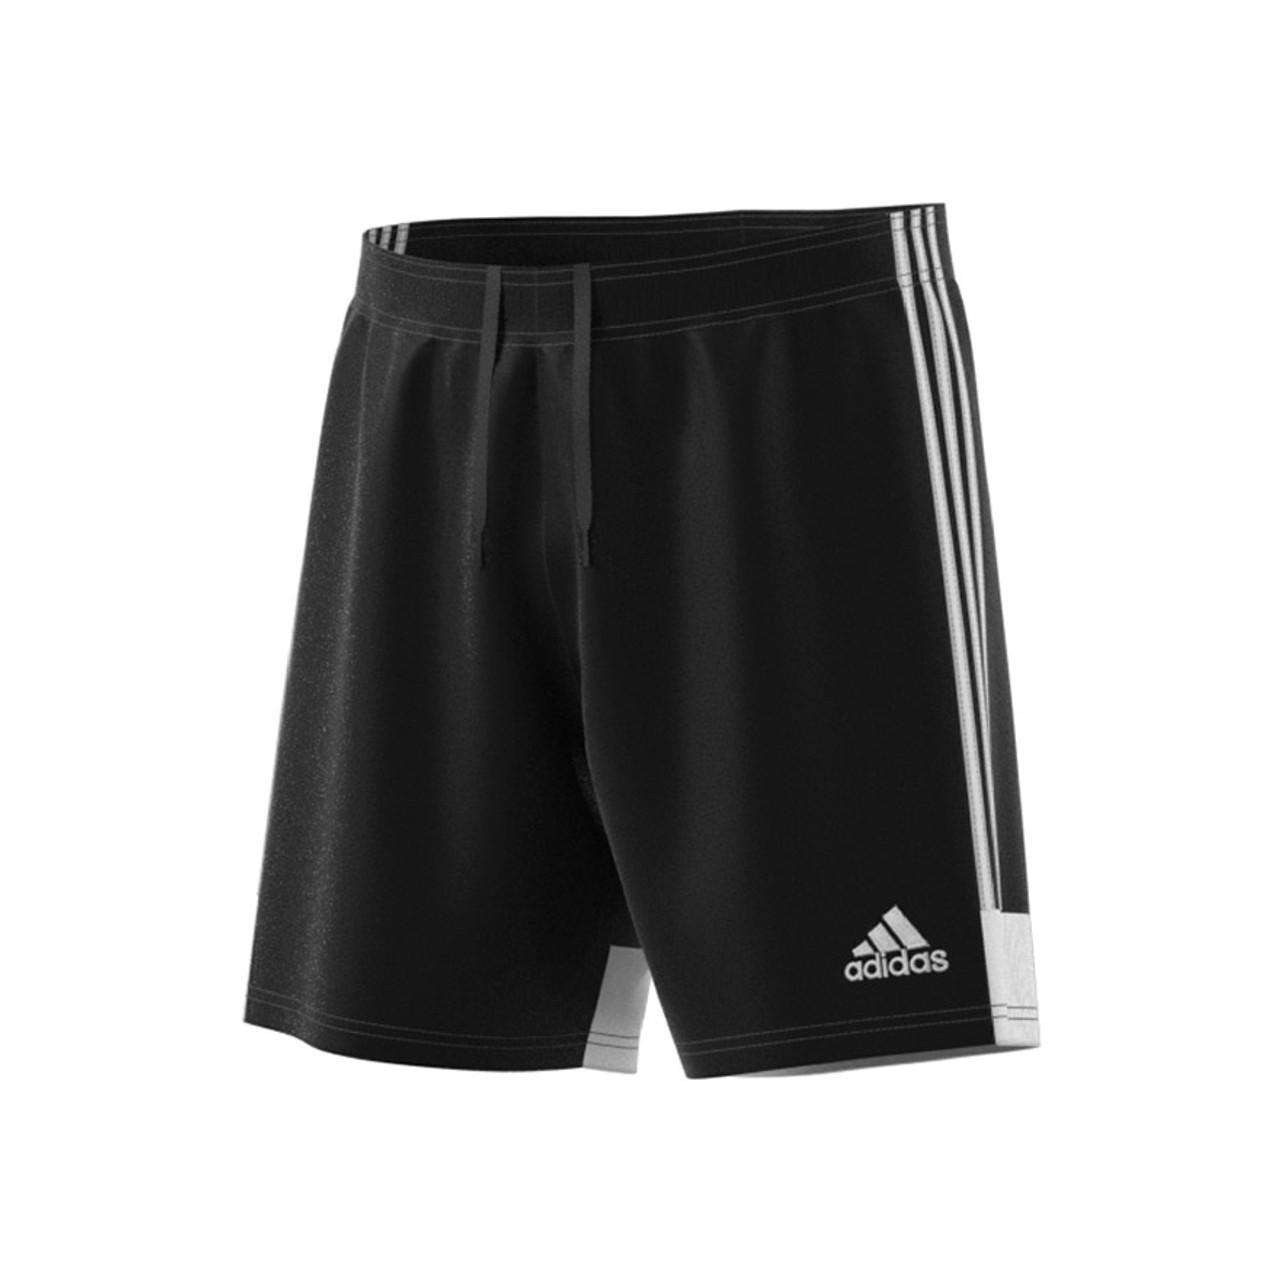 adidas Tastigo 19 Shorts (Rangers) - Soccer City